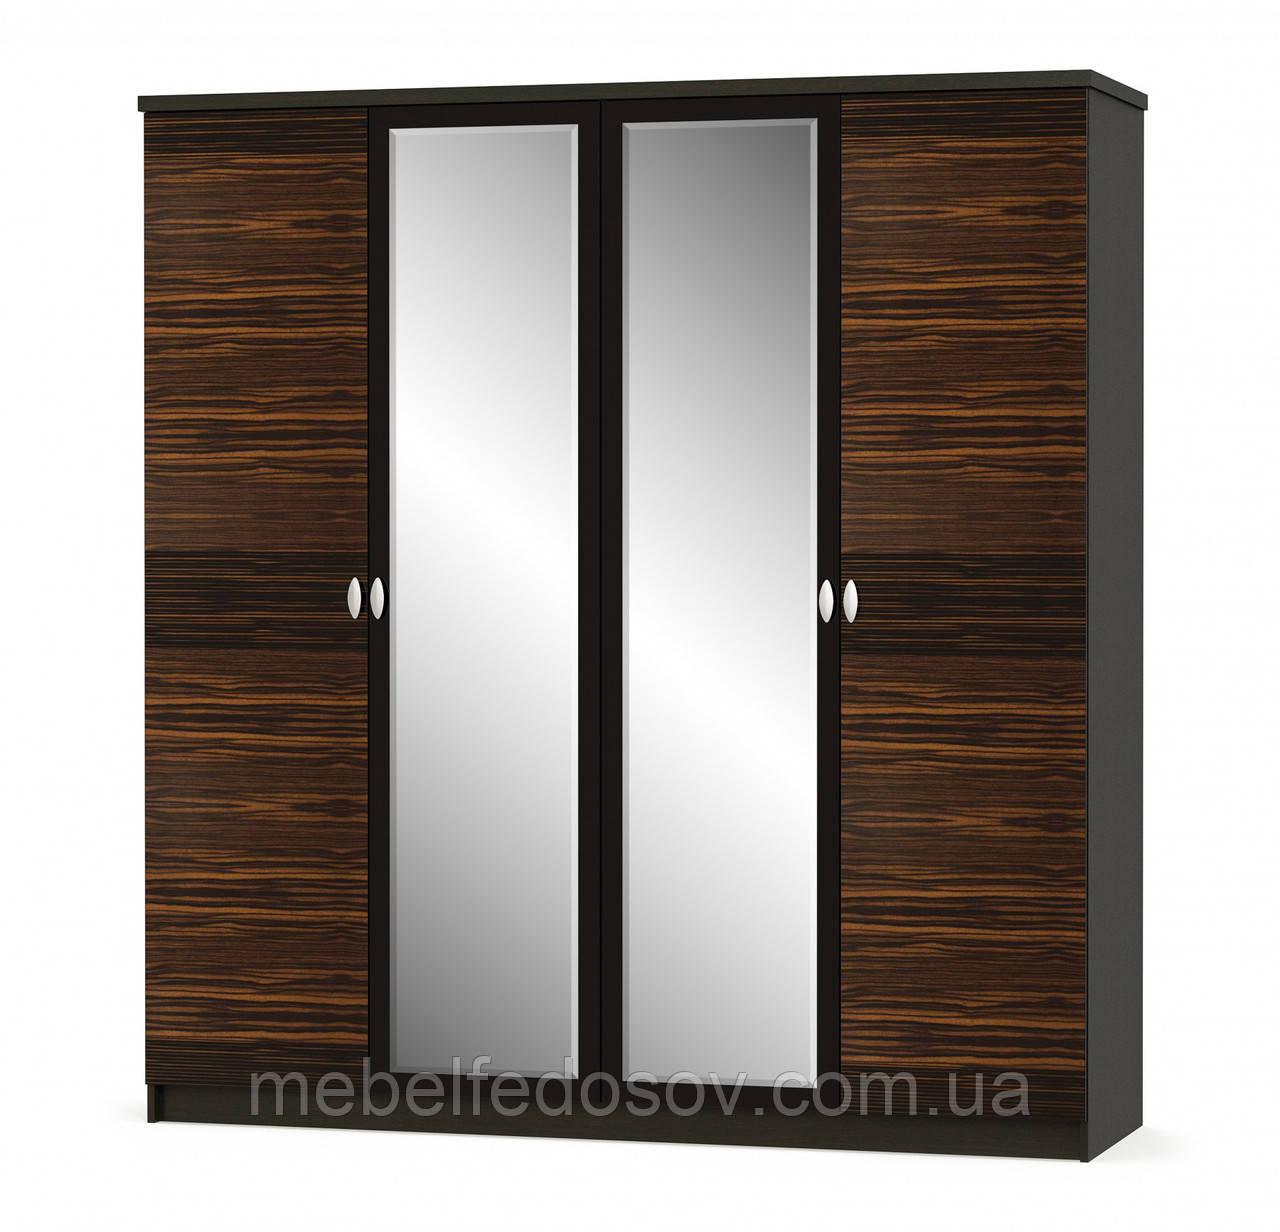 Шкаф 4Д Ева NEW (Мебель-Сервис)  2014х584х2141мм макасар